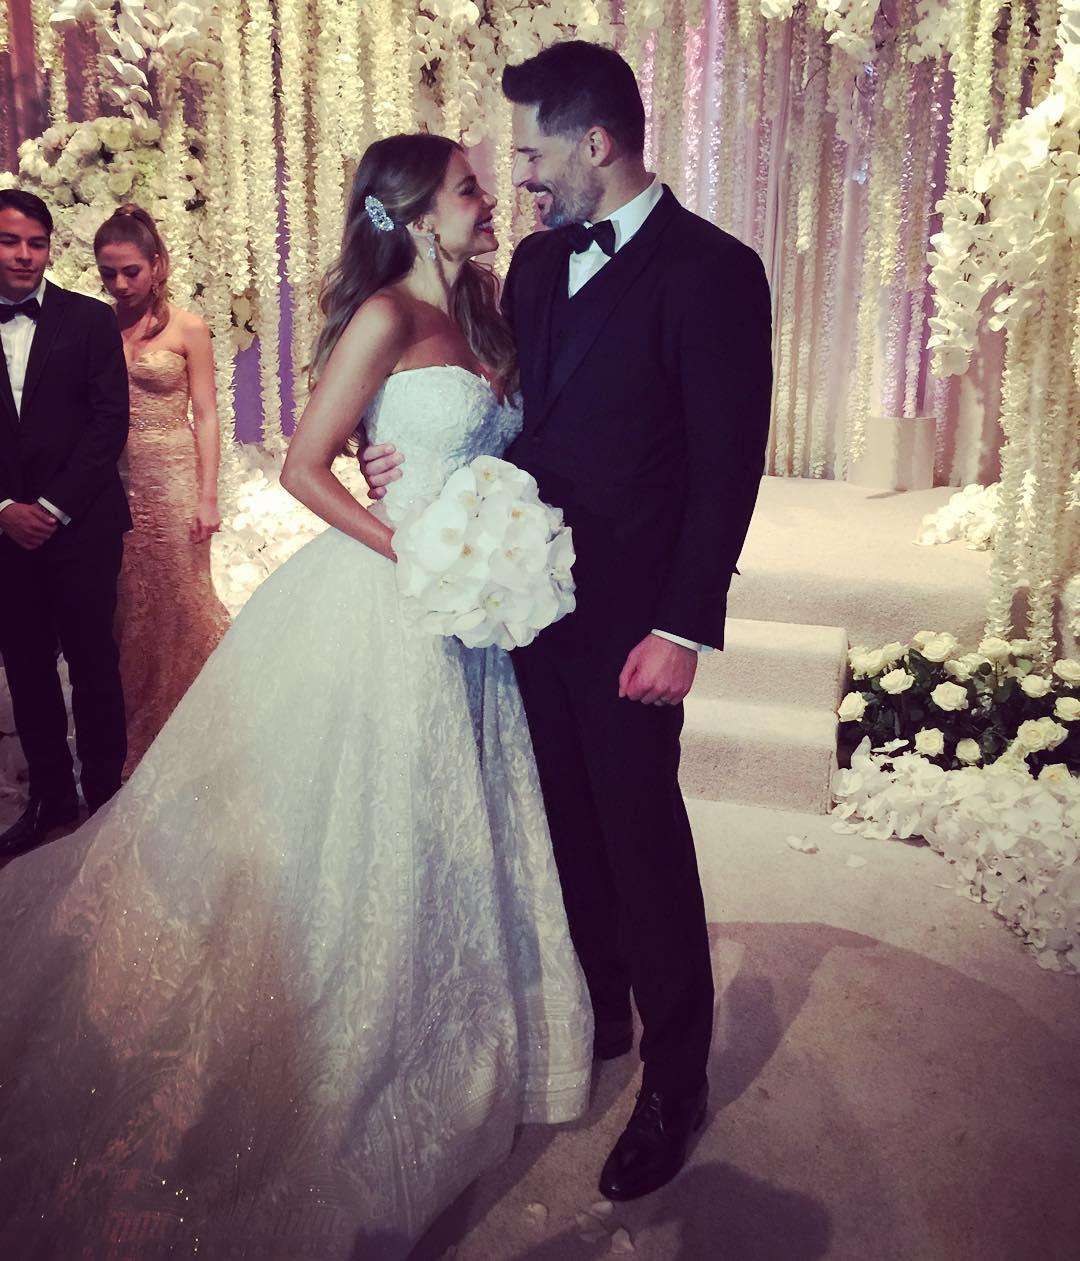 sofia-vergara-joe-manganiello-wedding